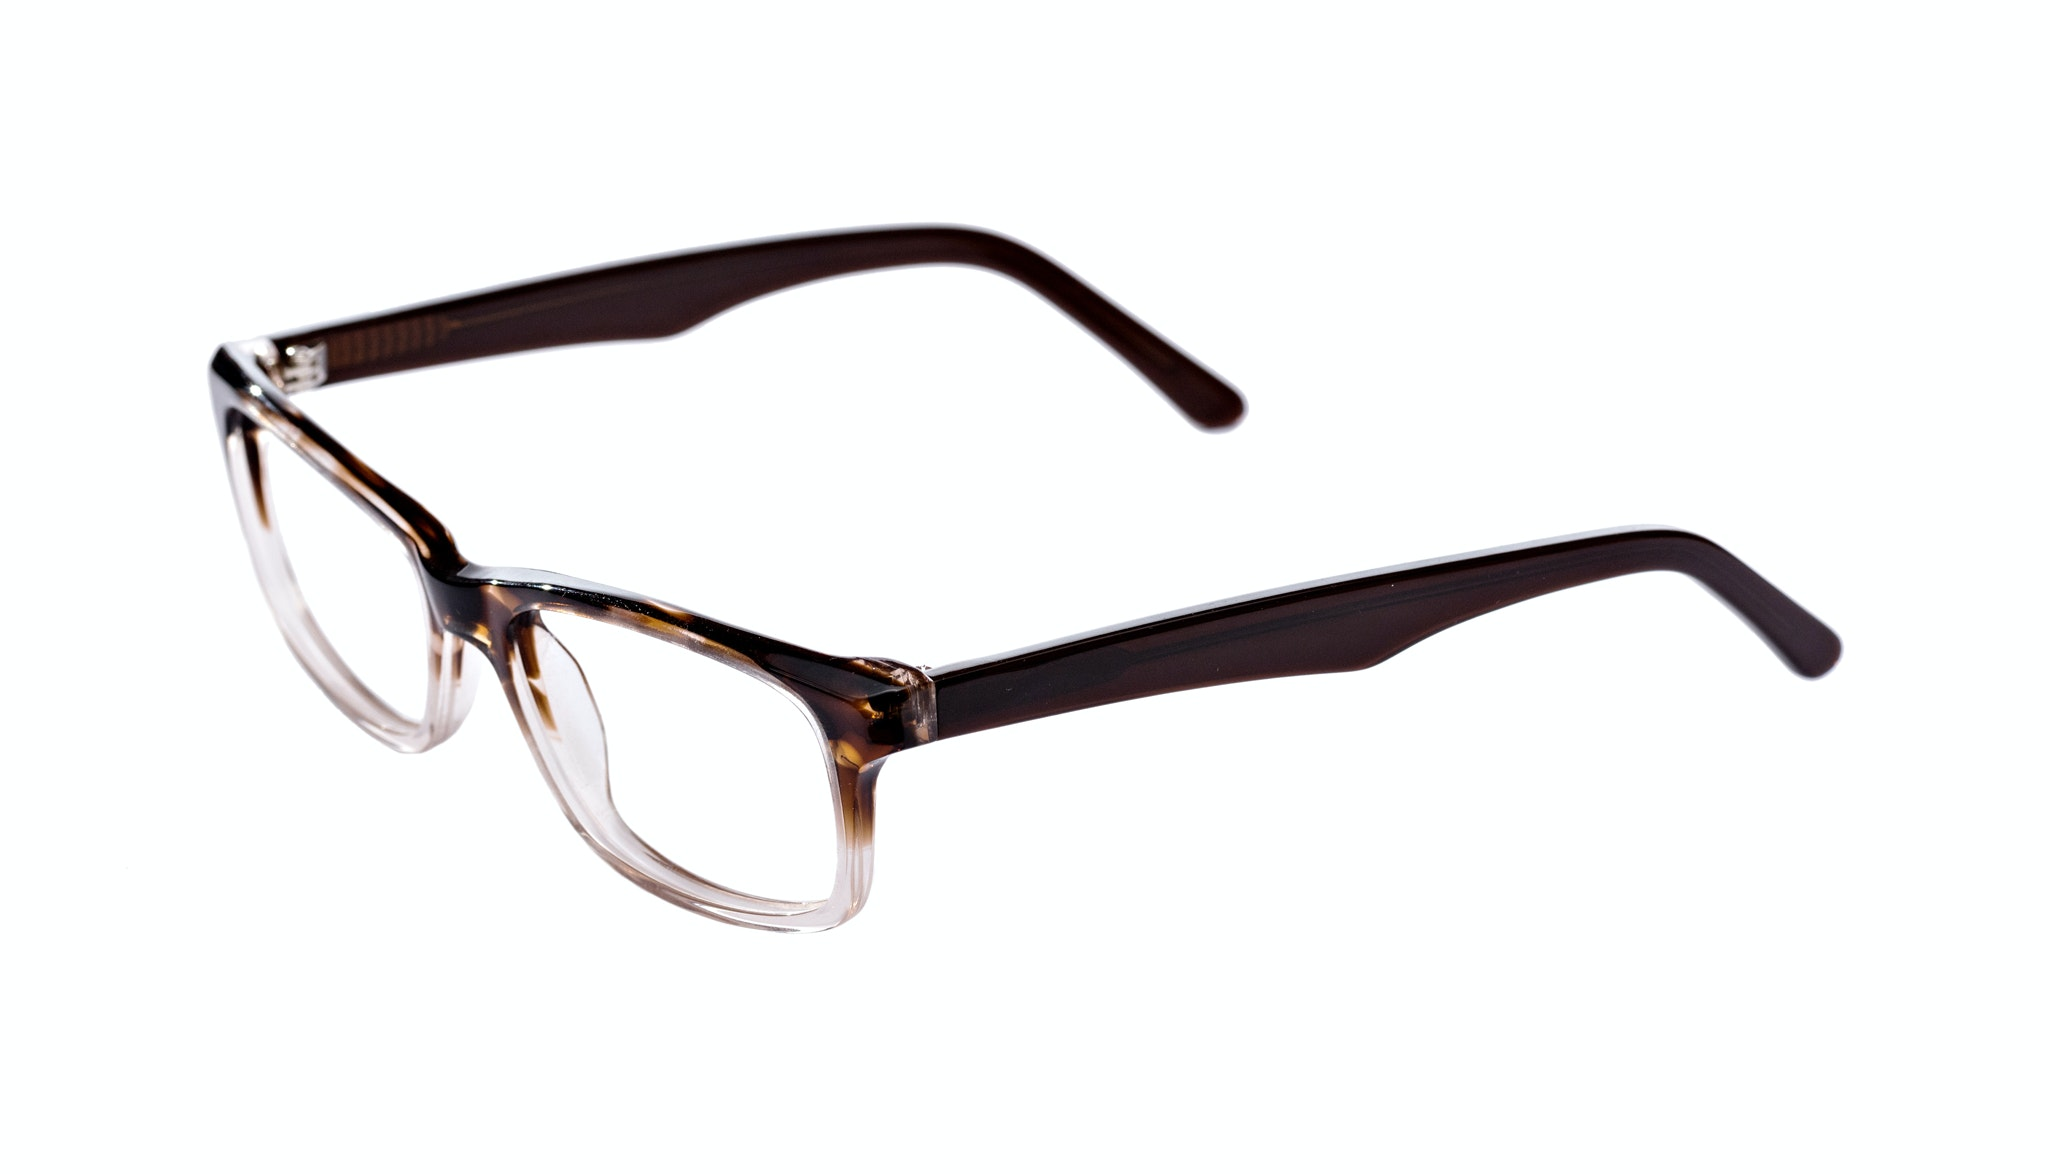 Affordable Fashion Glasses Rectangle Eyeglasses Men Women Atwater Bark Tilt